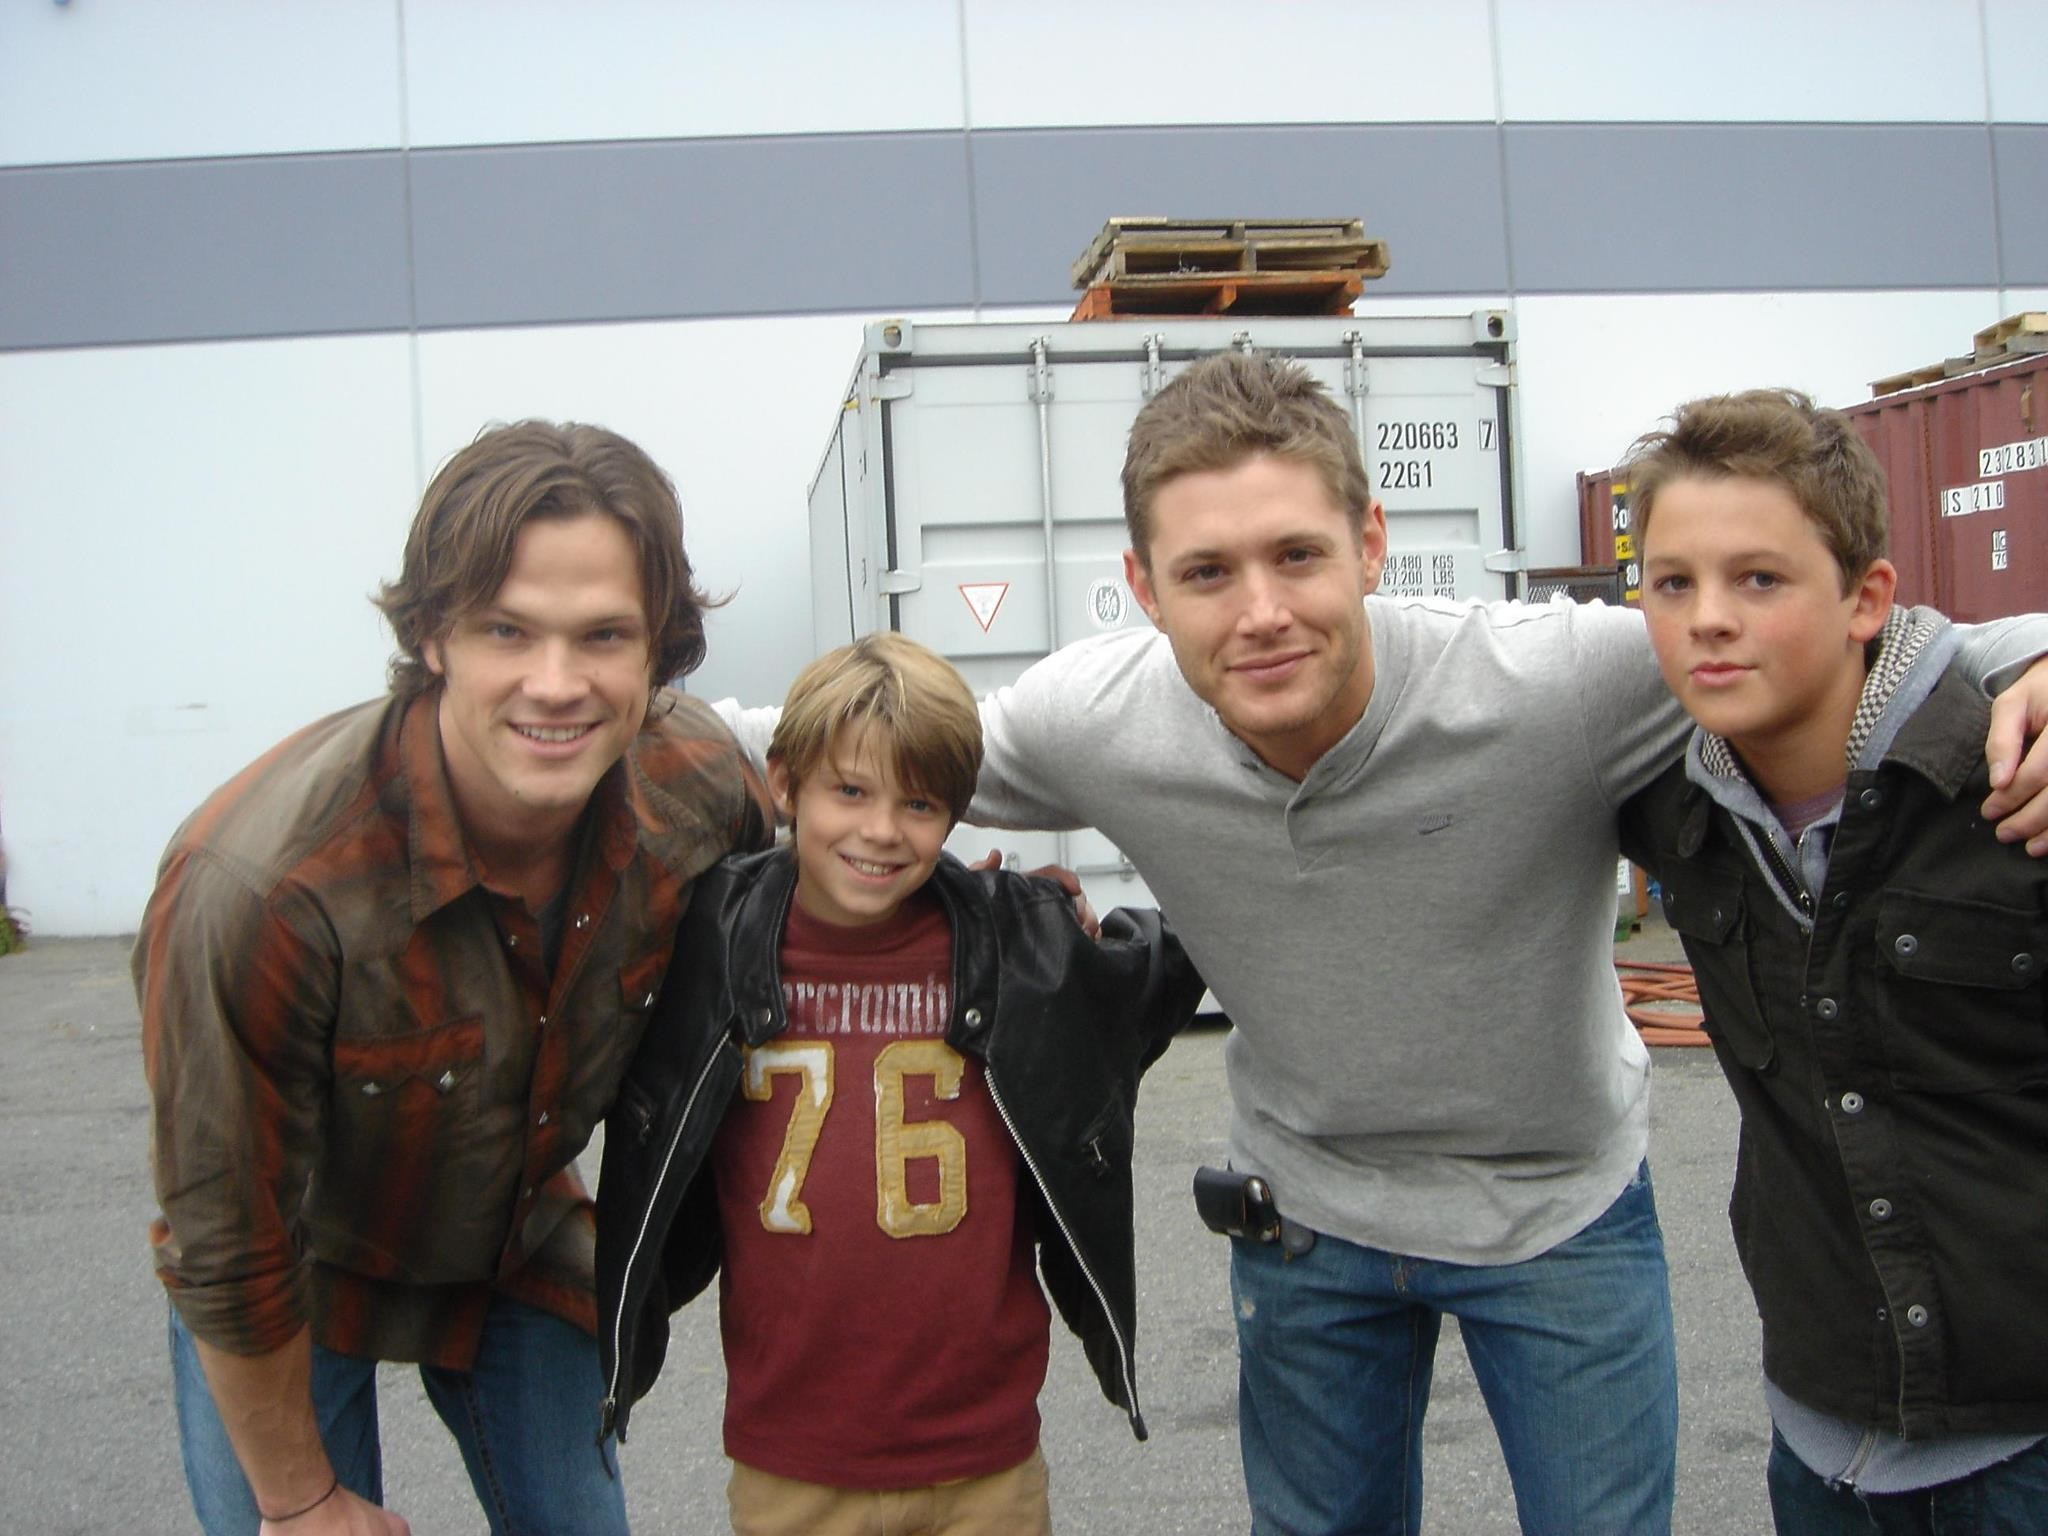 Image from  https://images6.fanpop.com/image/photos/34100000/Supernatural-Behind-The-Scenes- jared-padalecki-and-jensen-ackles-34107436-2048-1536.jpg.